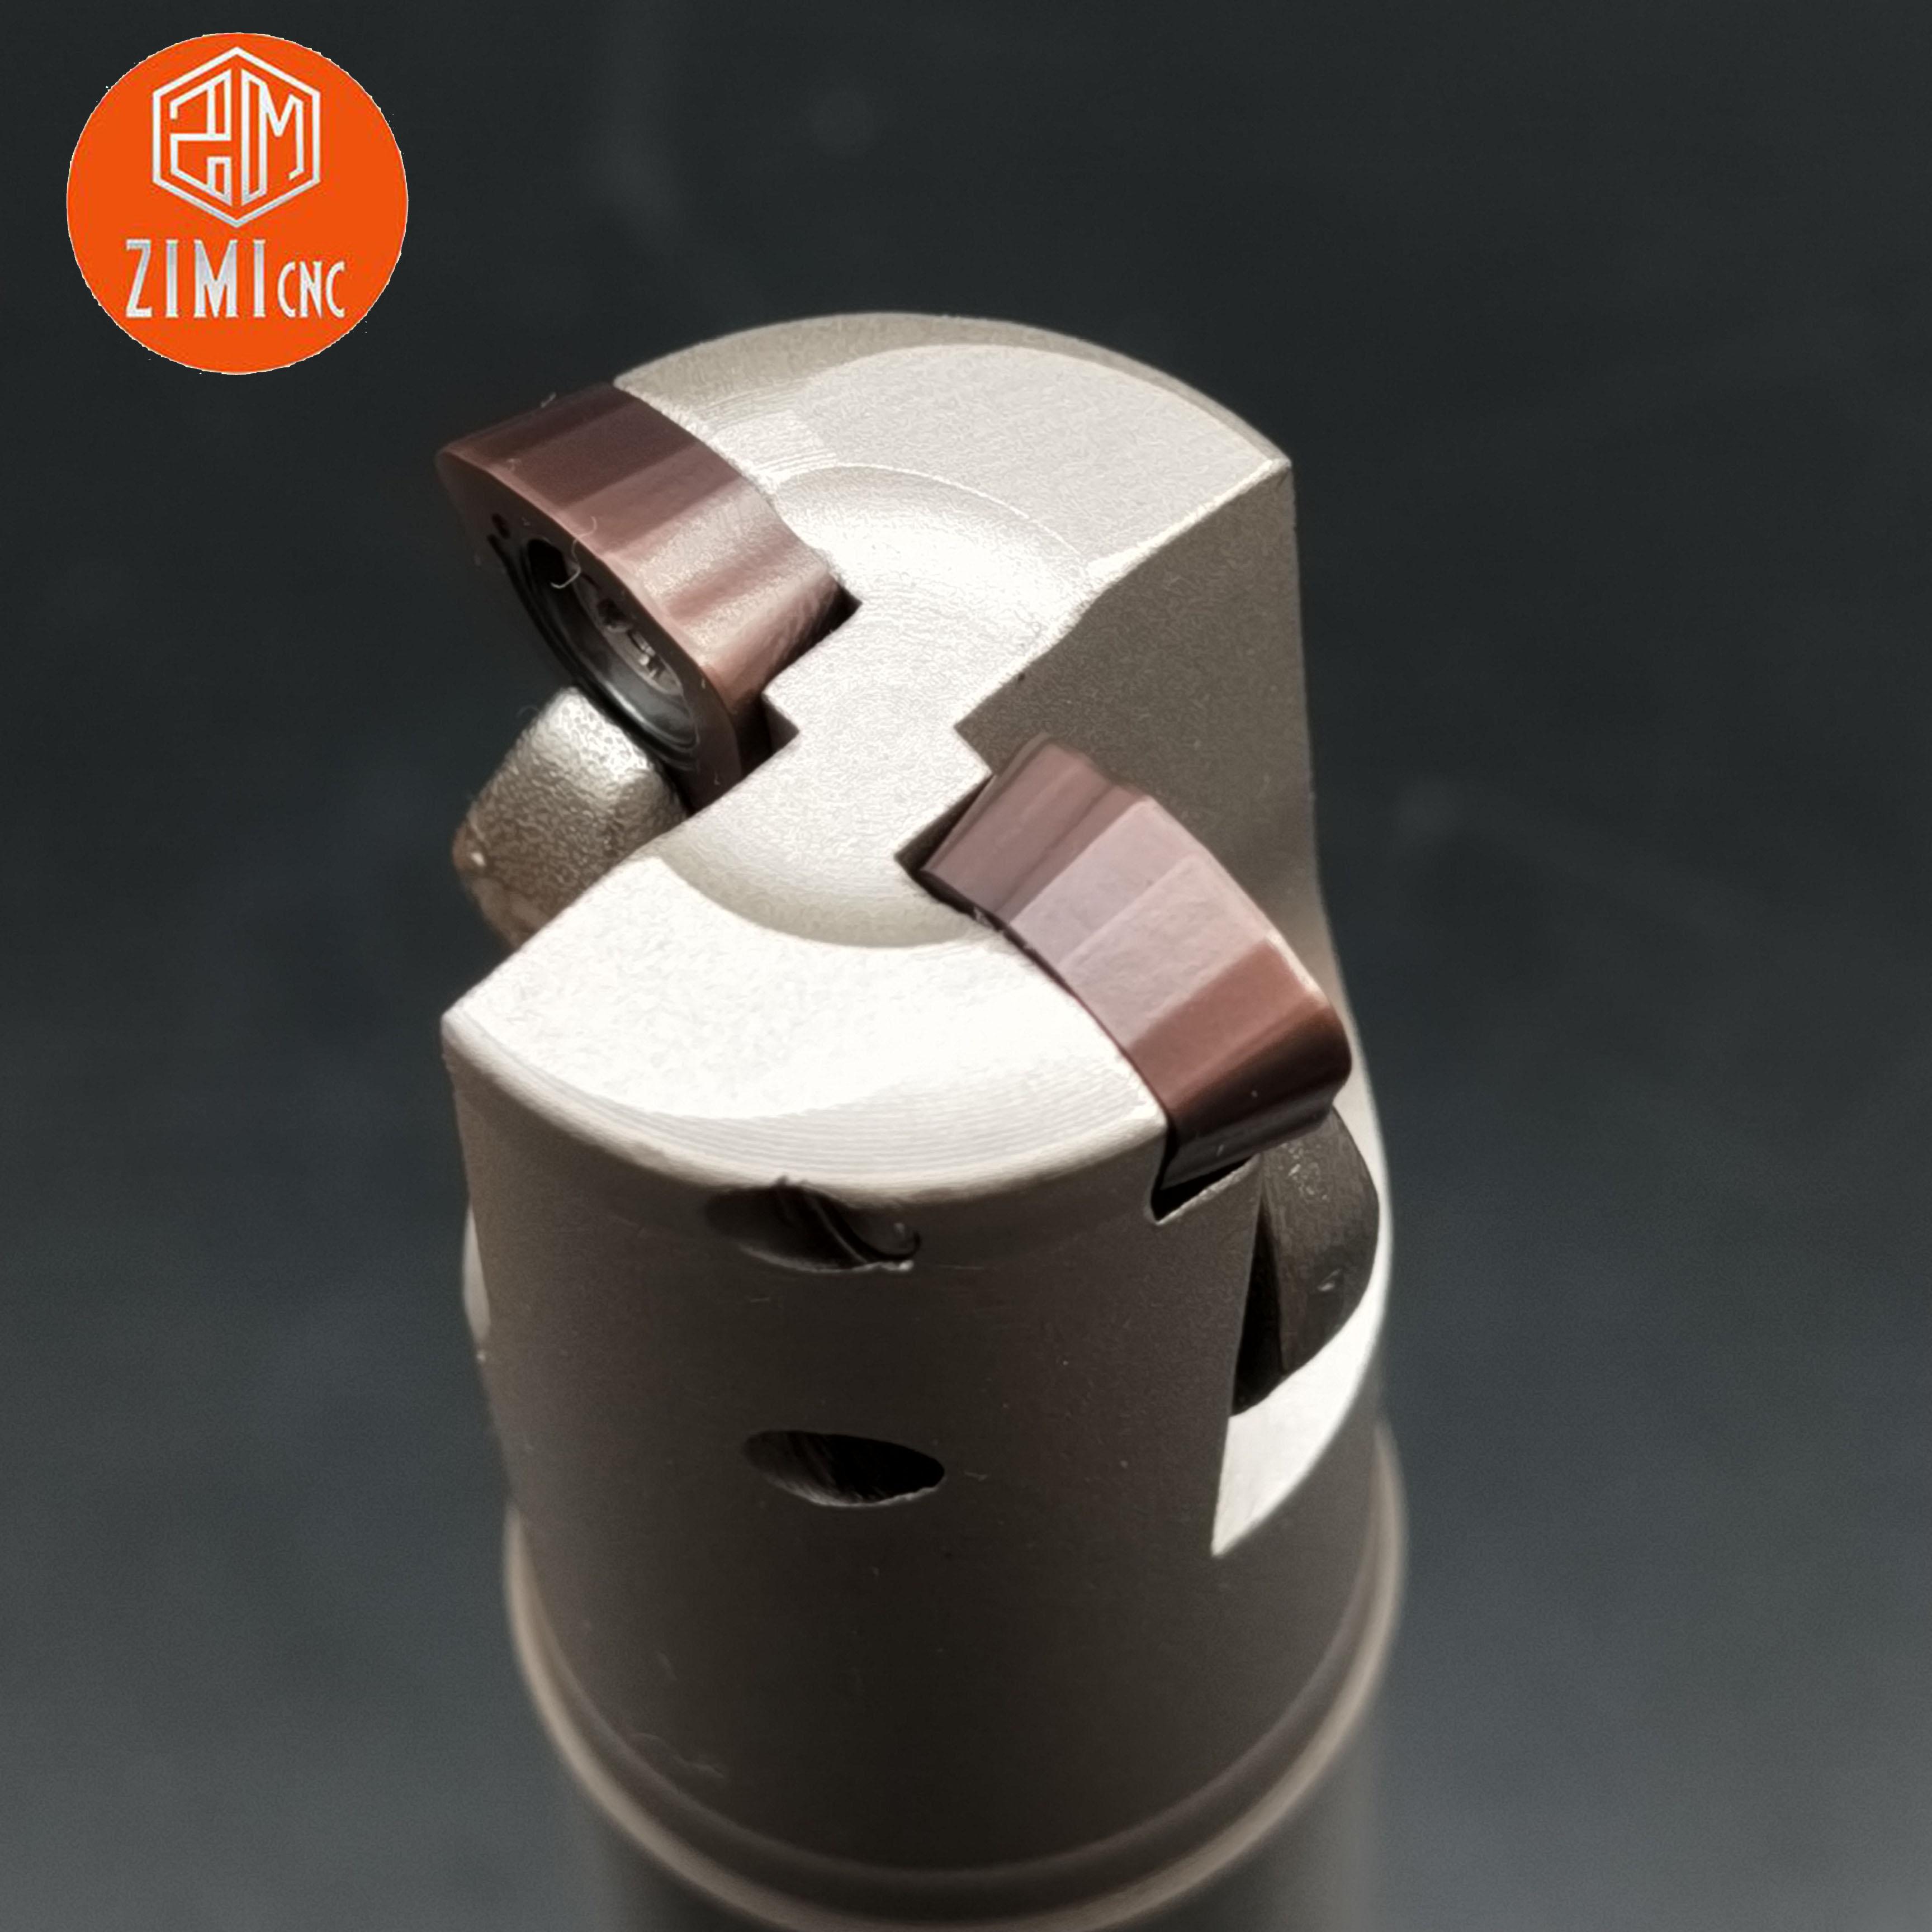 1pcs AJX09 C25-26-150face Milling 2-blade Indexable Milling Cutter+10pcs JDMW09T320ZDSR-FT VP15TF Carbide Boring Tools